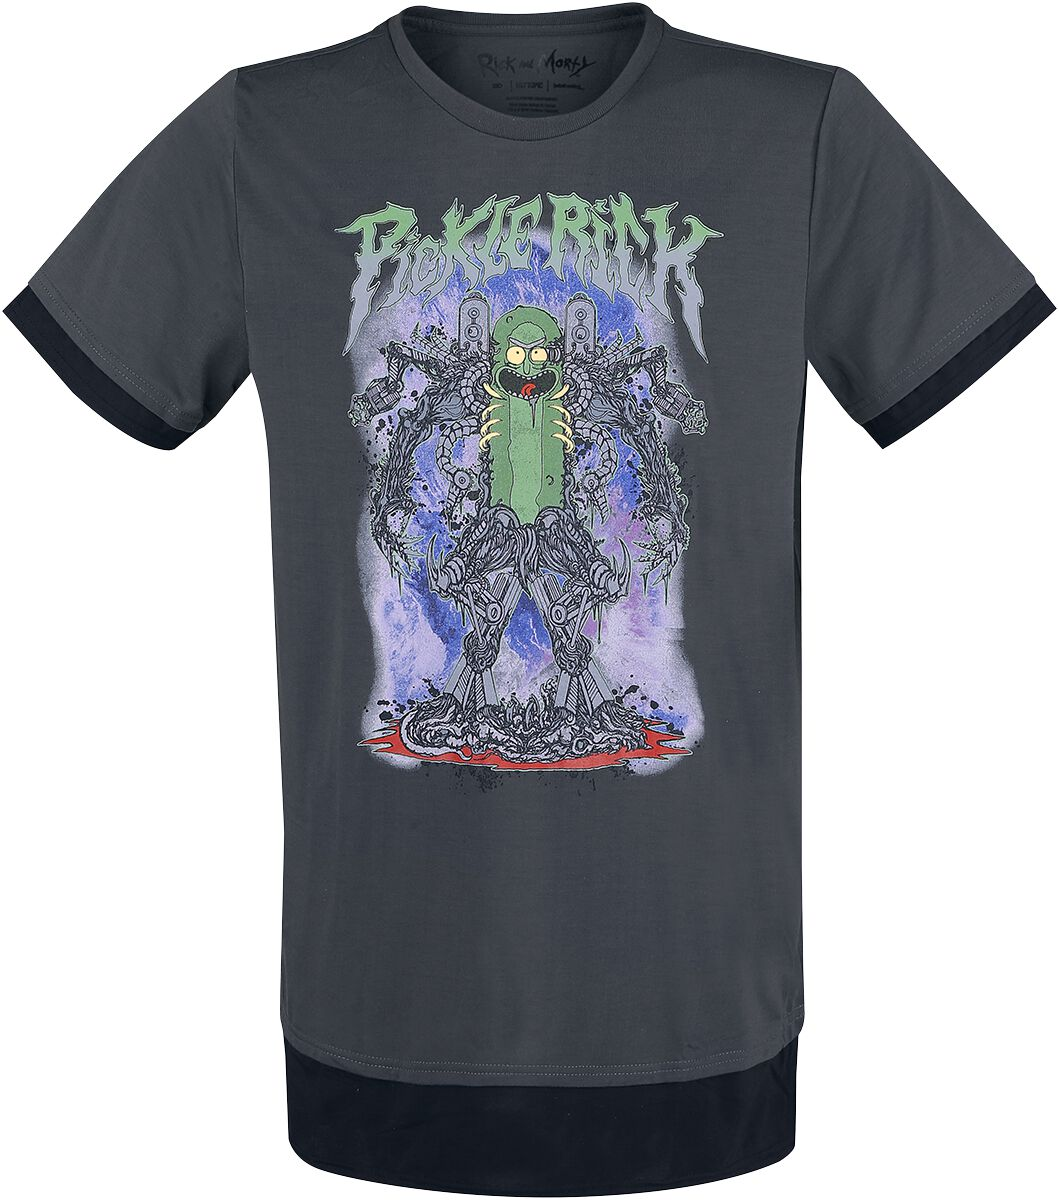 Image of   Rick And Morty Brutal Rick T-Shirt sort